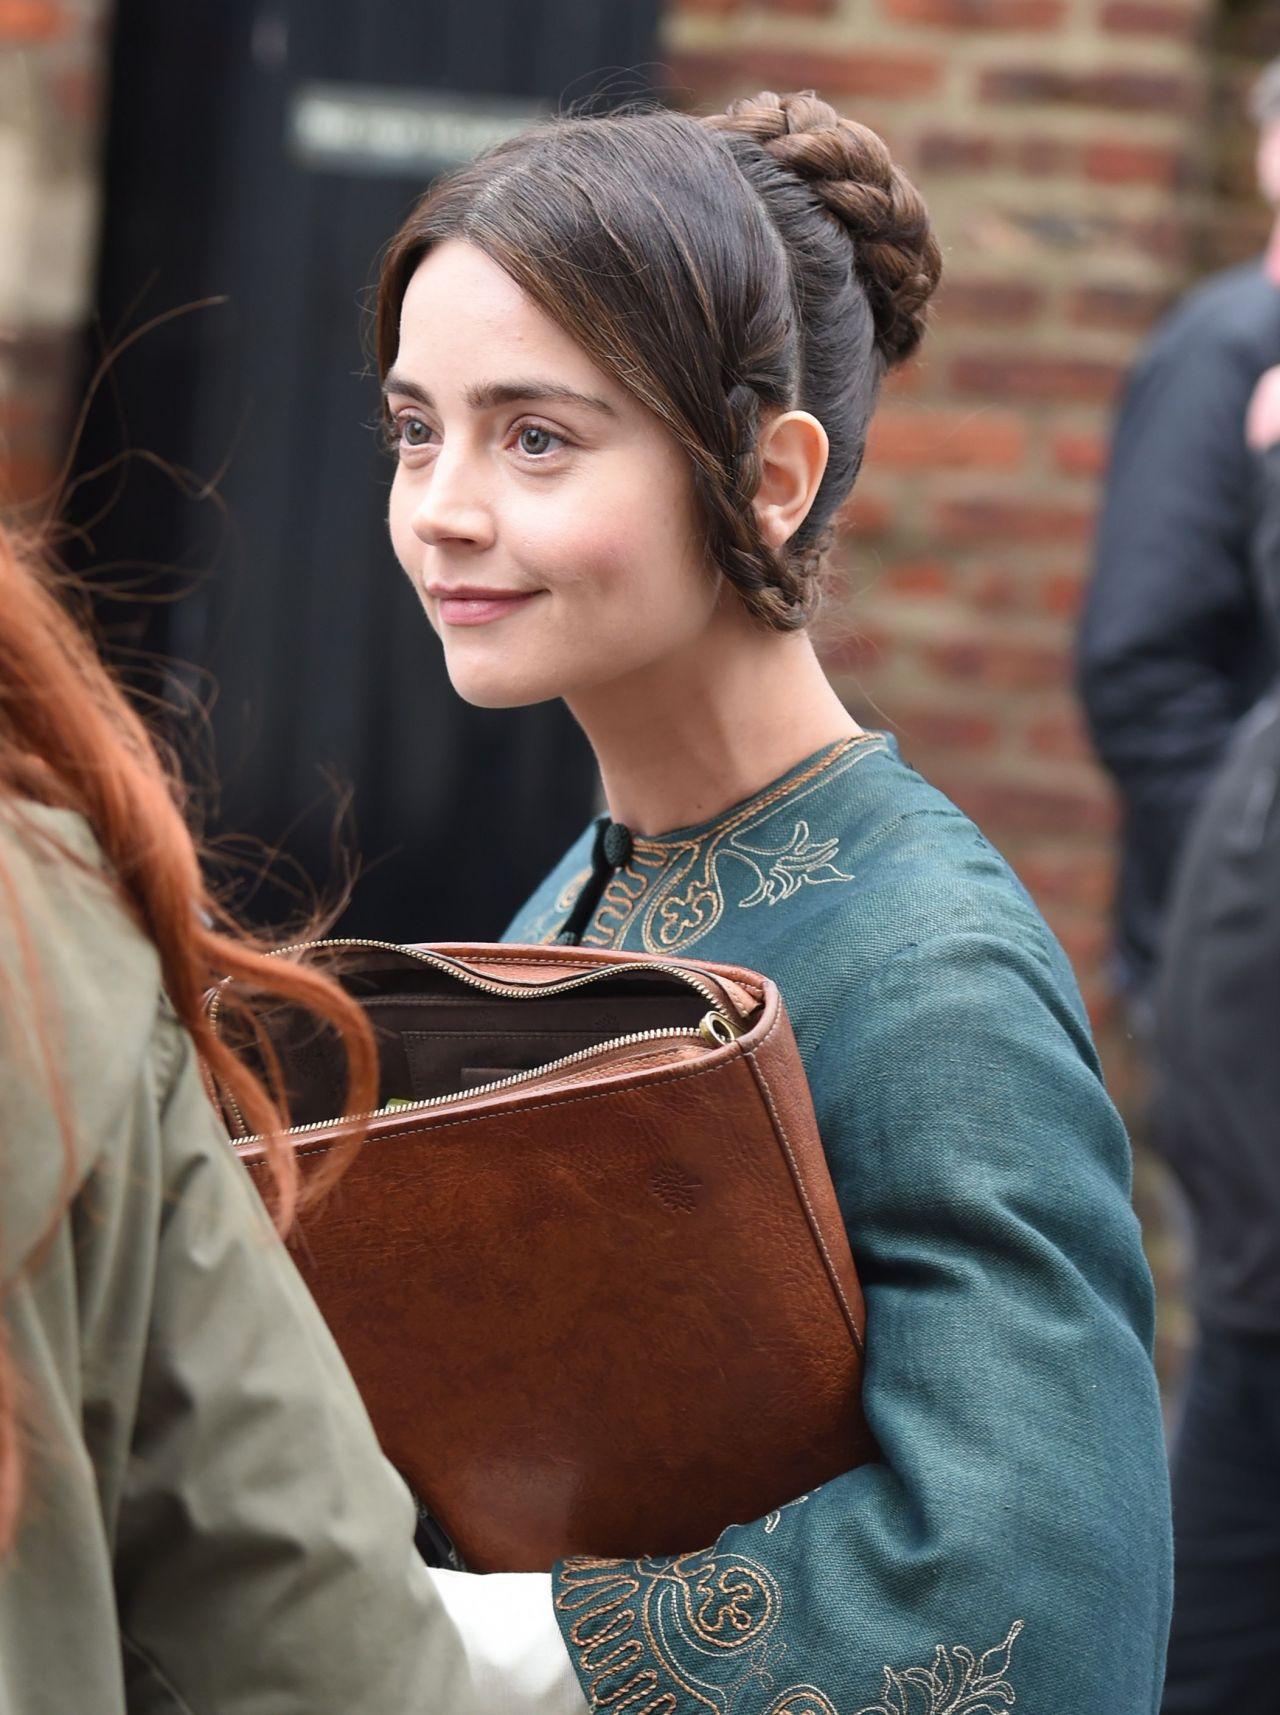 Jenna Coleman Victoria Set In Beverley East Yorkshire